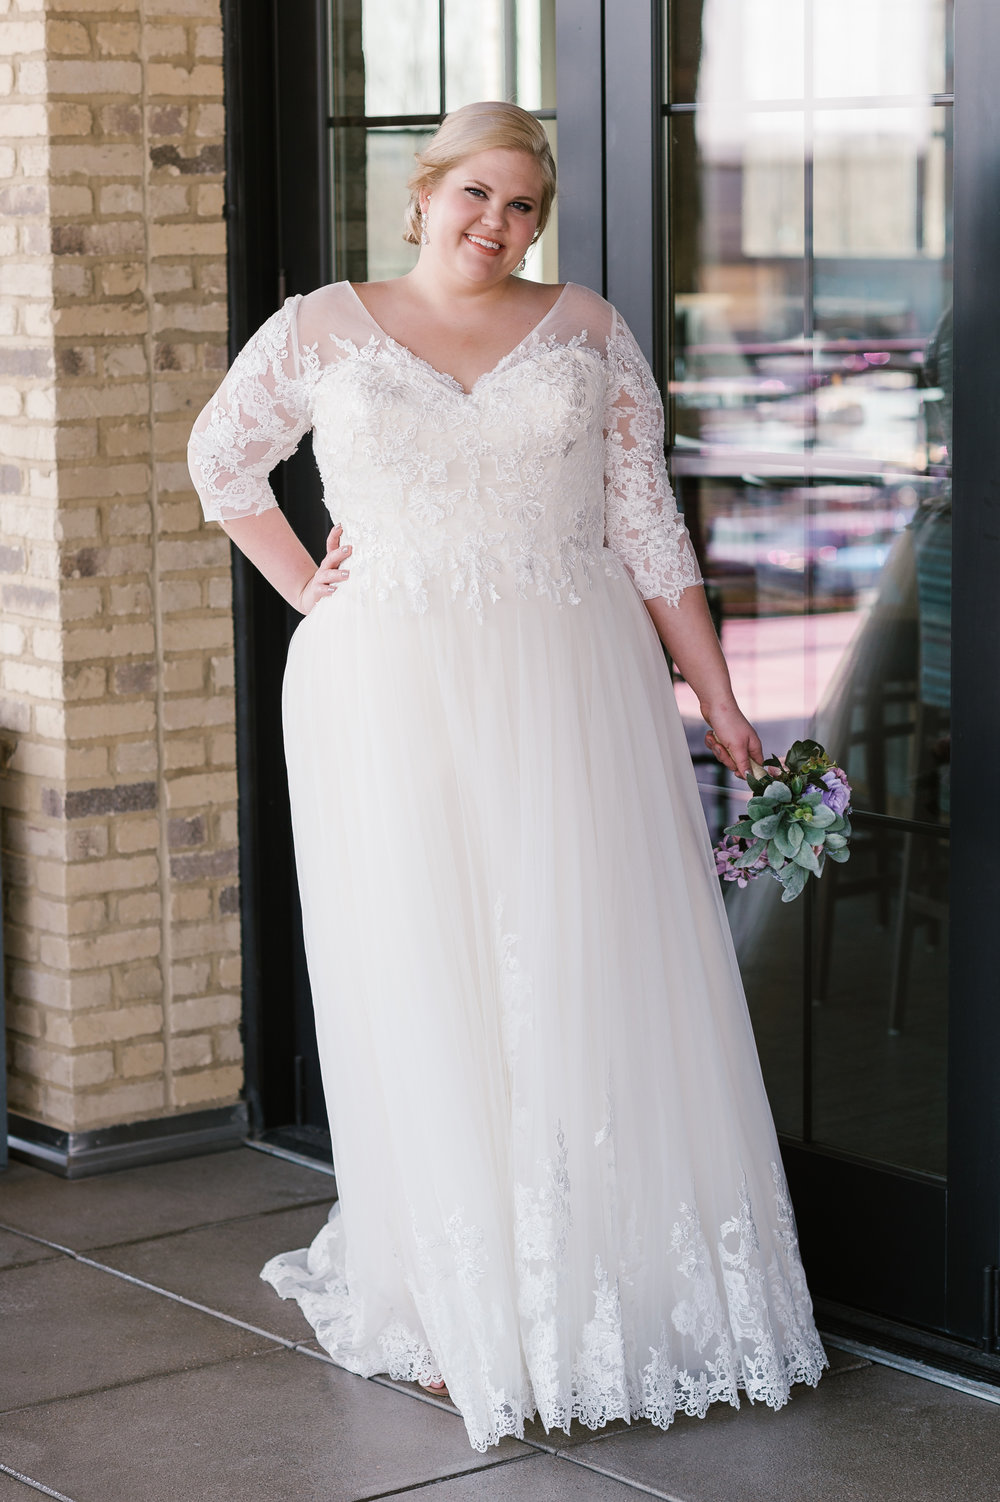 BridesbyYoung-IndianapolisIndianaSchaumburgChicagoIllinois-CurvyPlusSizeBridalStore-PrivateCollection-14.JPG